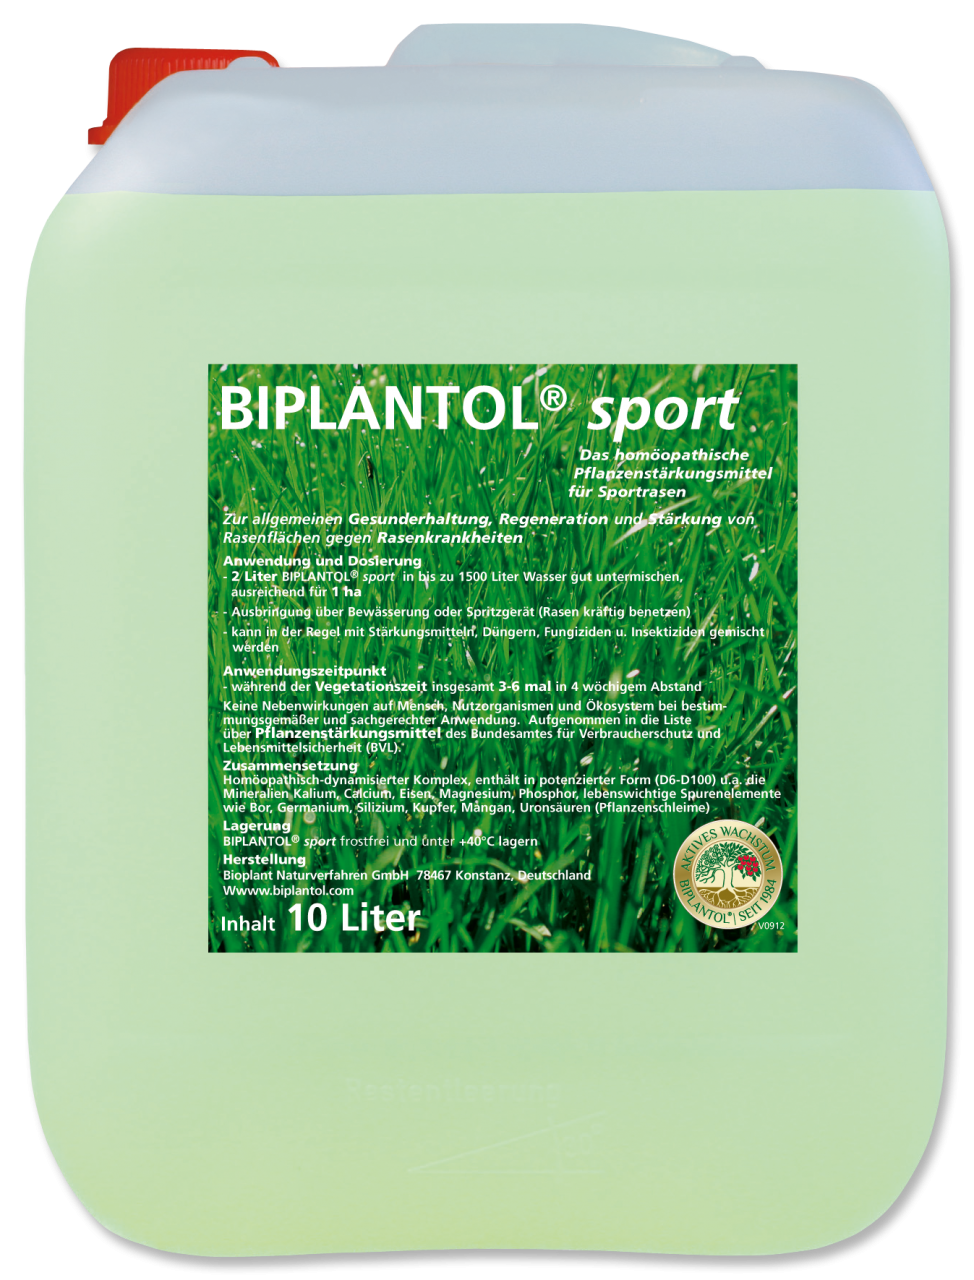 BIPLANTOL® sport